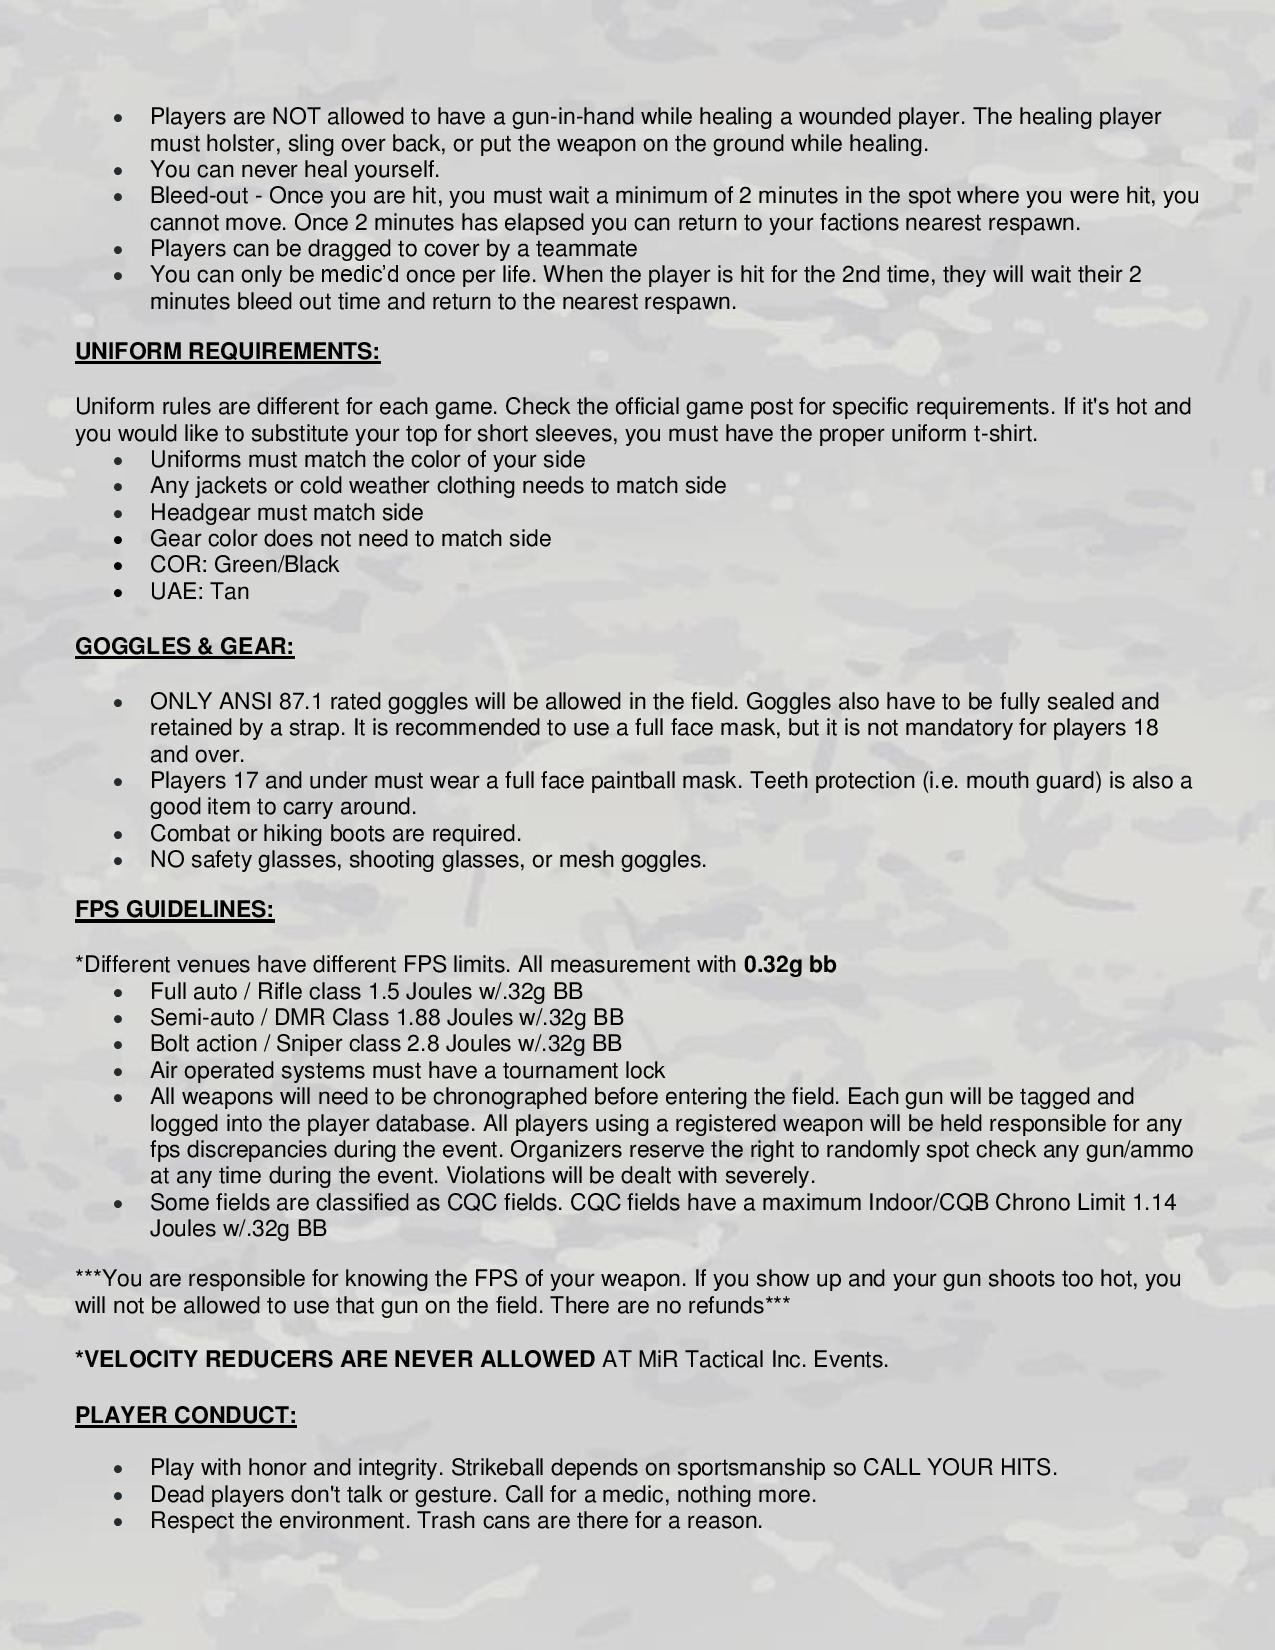 mir-tactical-strikeball-airsoft-sop-v1.1-page-004.jpg